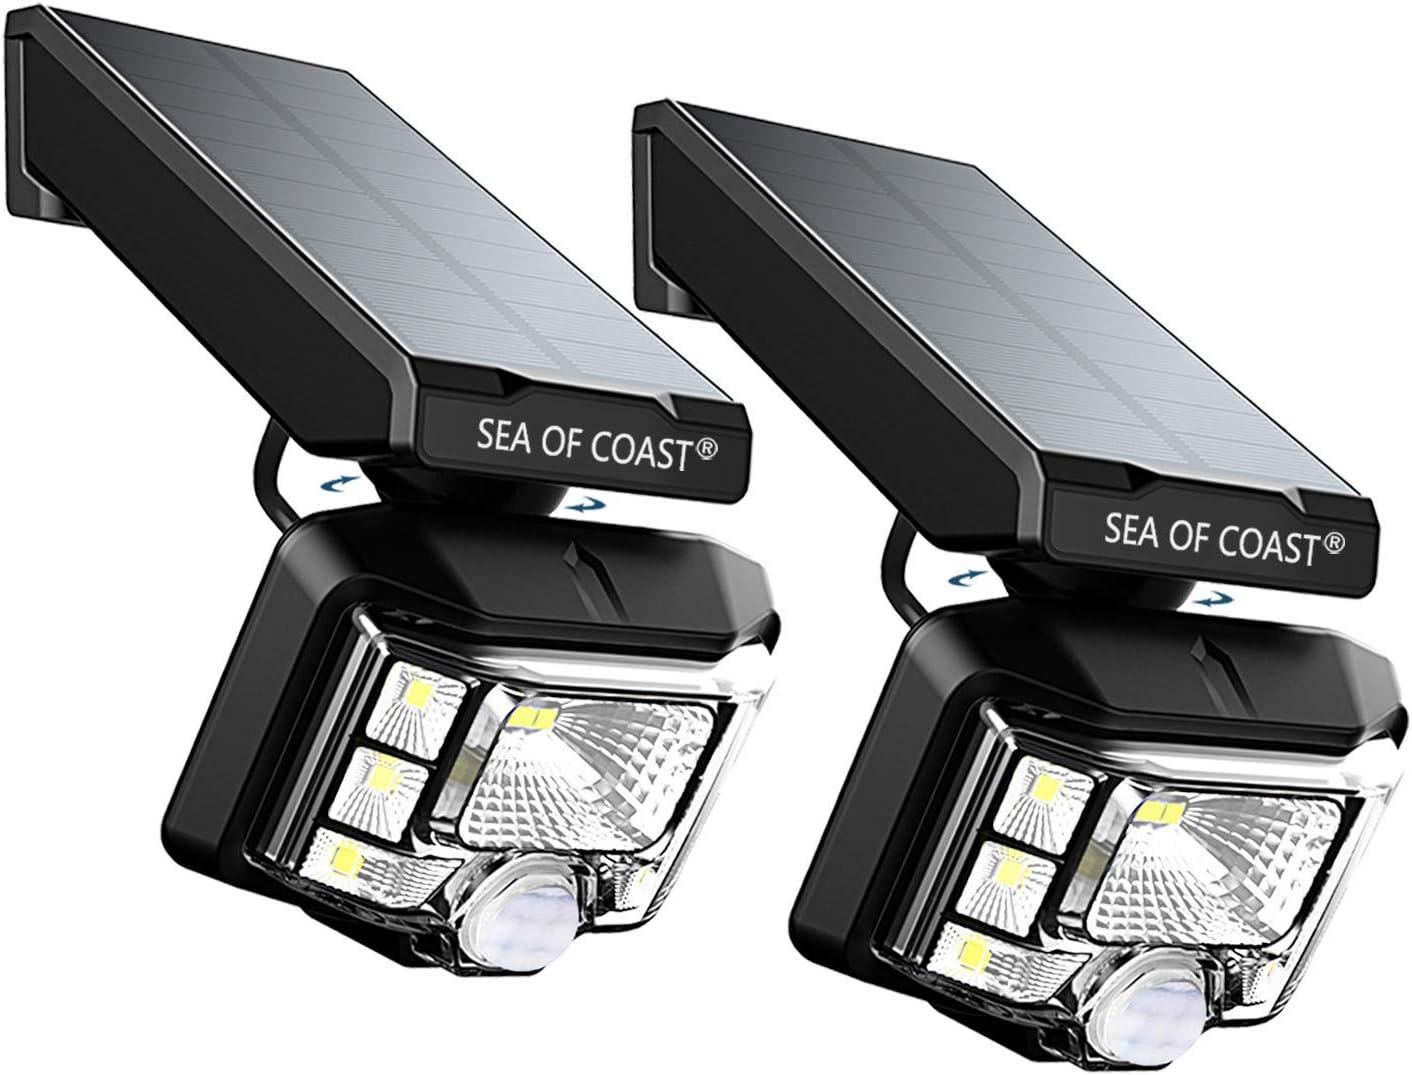 Outdoor Wireless Solar Lights, Intelligent dynami Sensor, 8 LED Lighting Super Bright Motion Sensor Light, Wall Solar Light Outdoor Security Lighting – IP65 Waterproof Solar Light for Patio 2pack